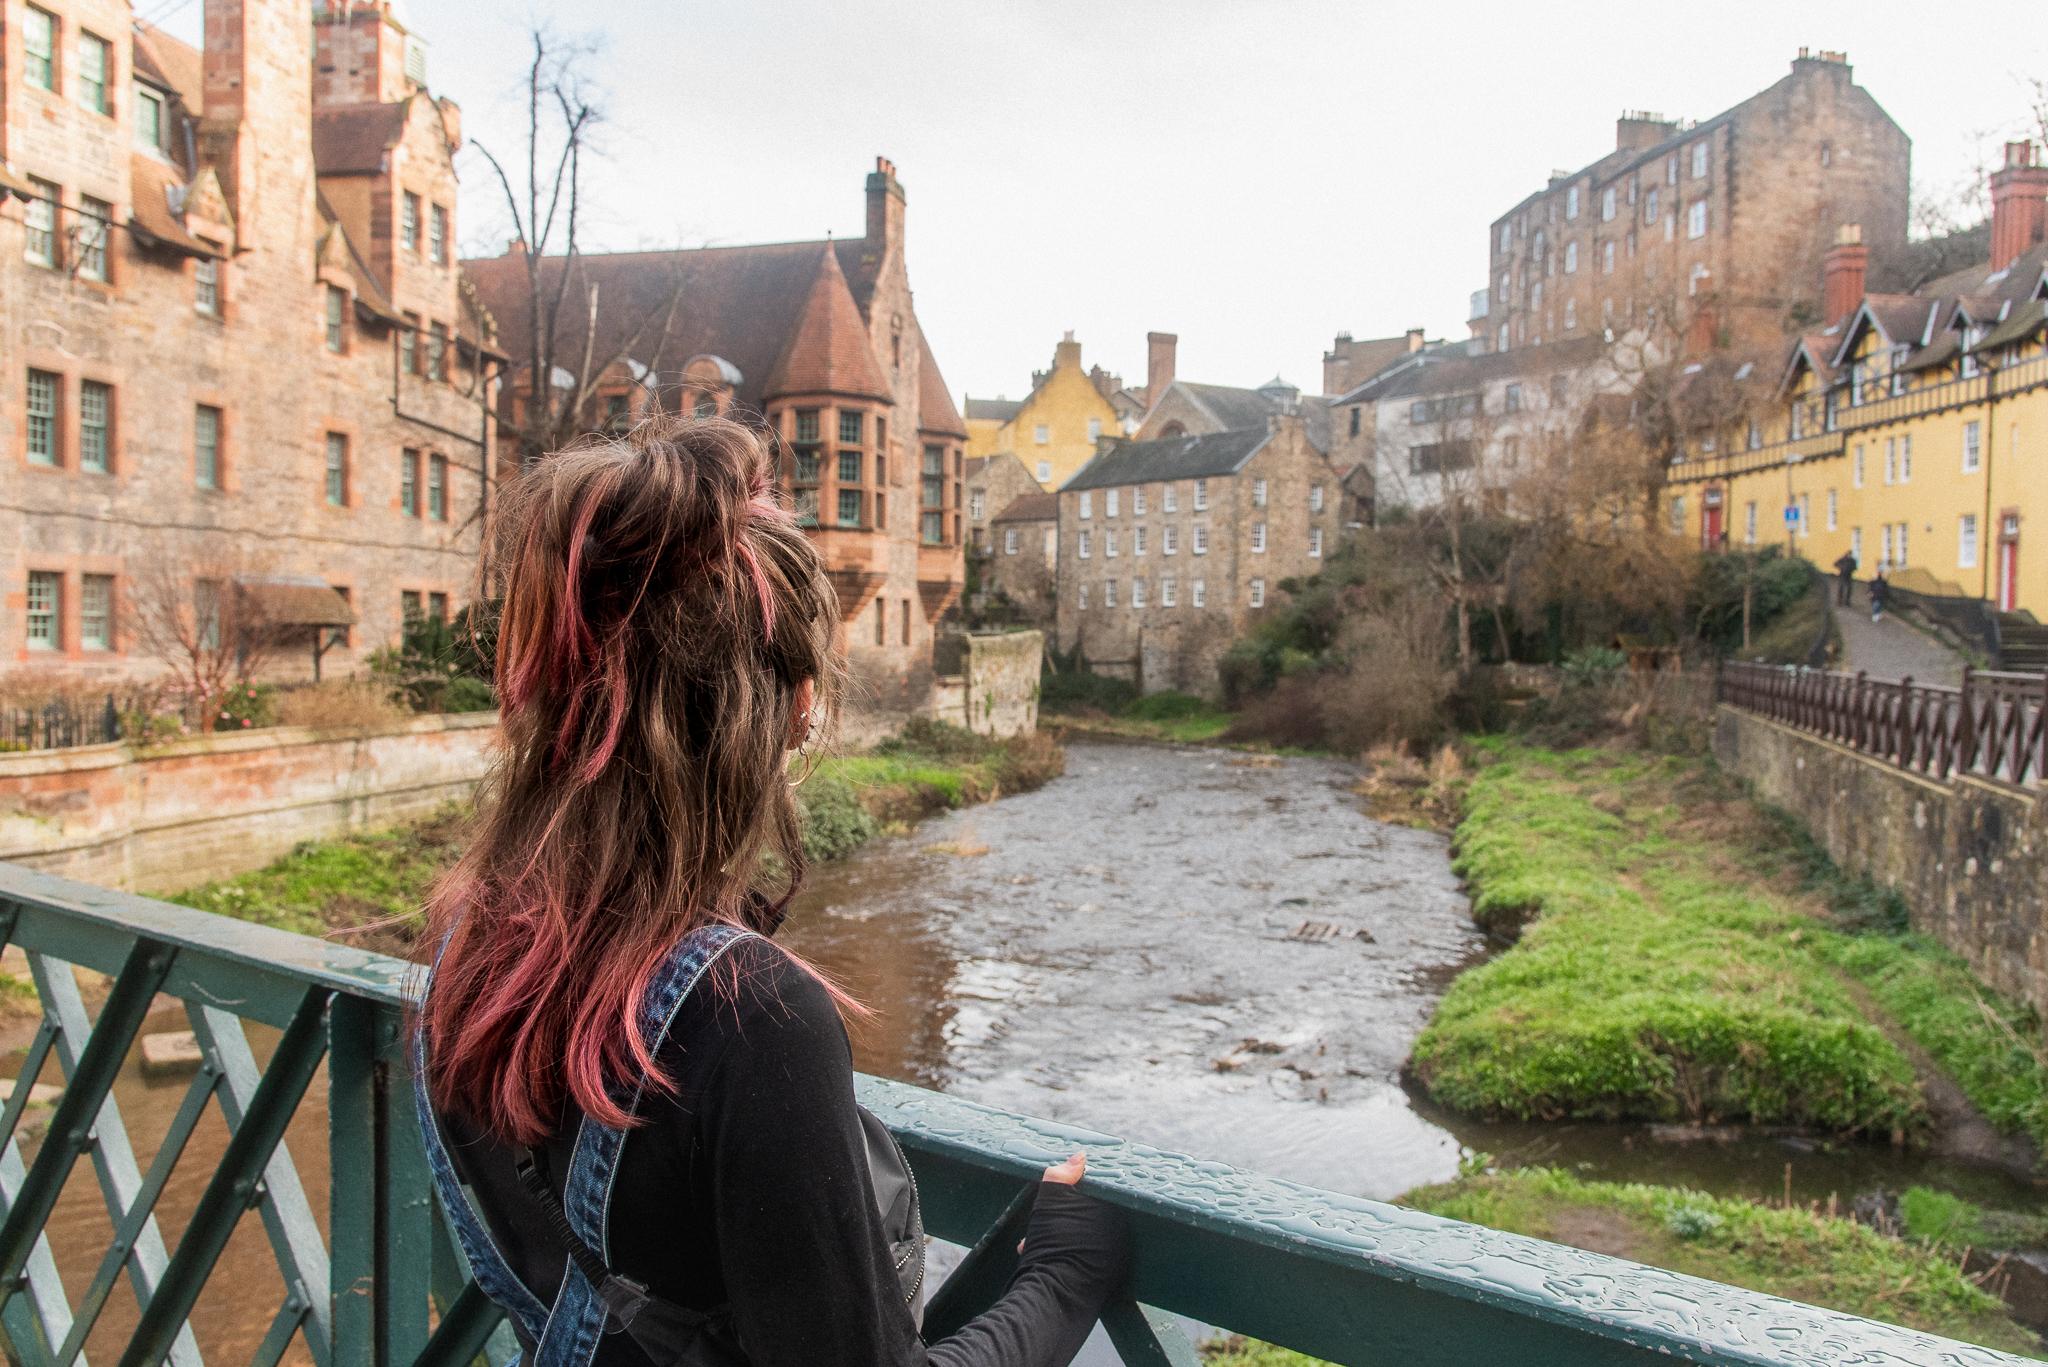 University Of Edinburgh Wikimedian In Residence